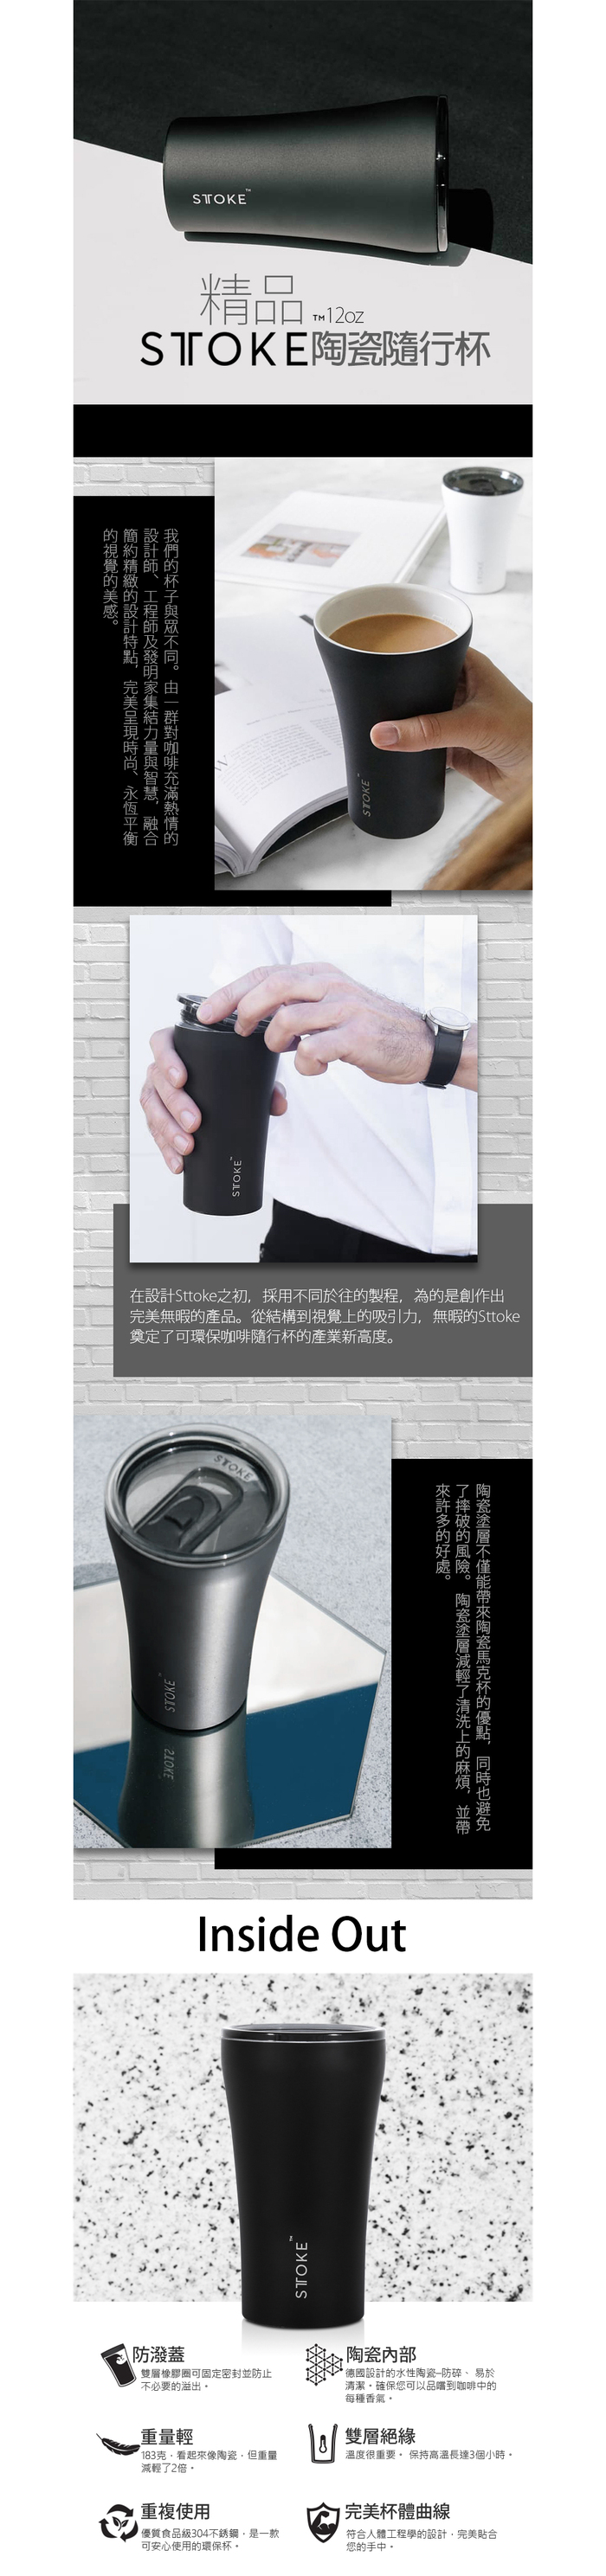 STTOKE 12oz(360ml) 精品陶瓷隨行杯 (奢華黑)